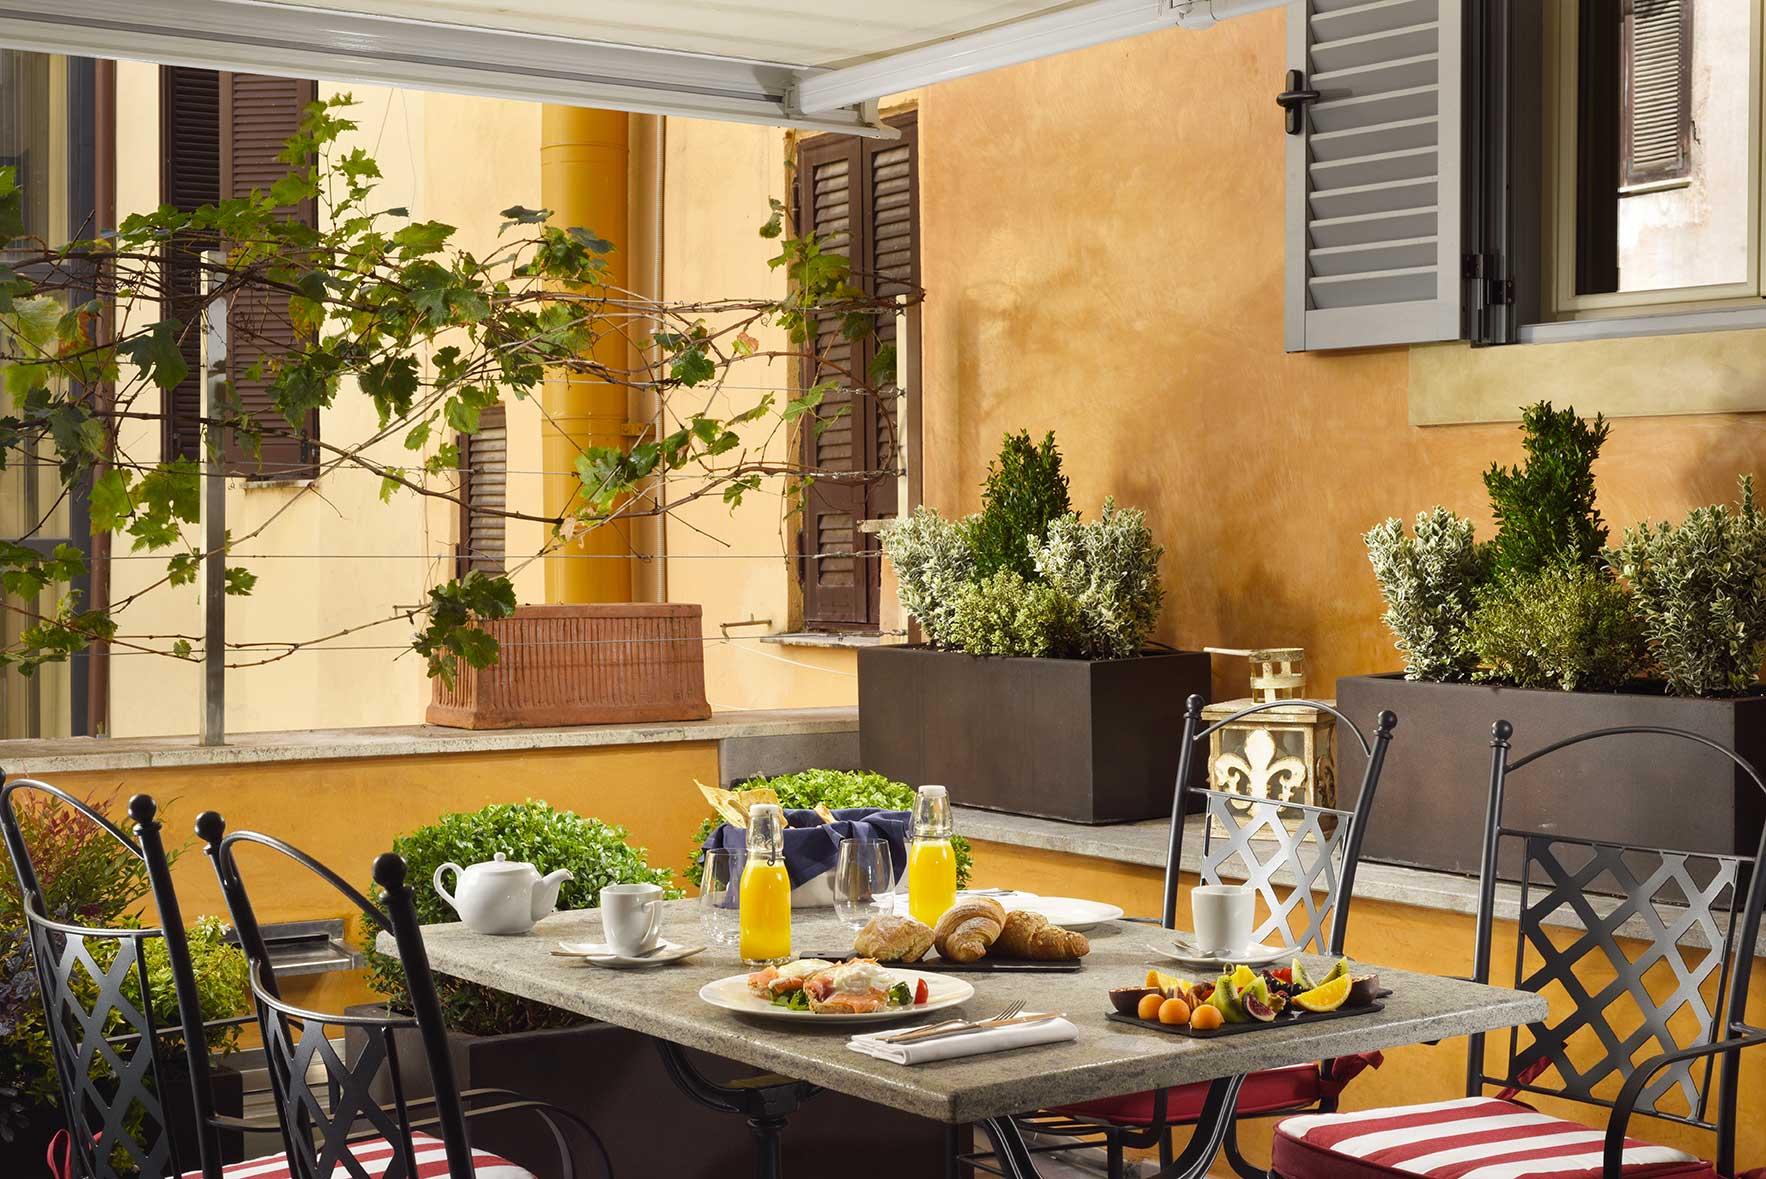 Eating & Drinking - Hotel De' Ricci - Breakfast